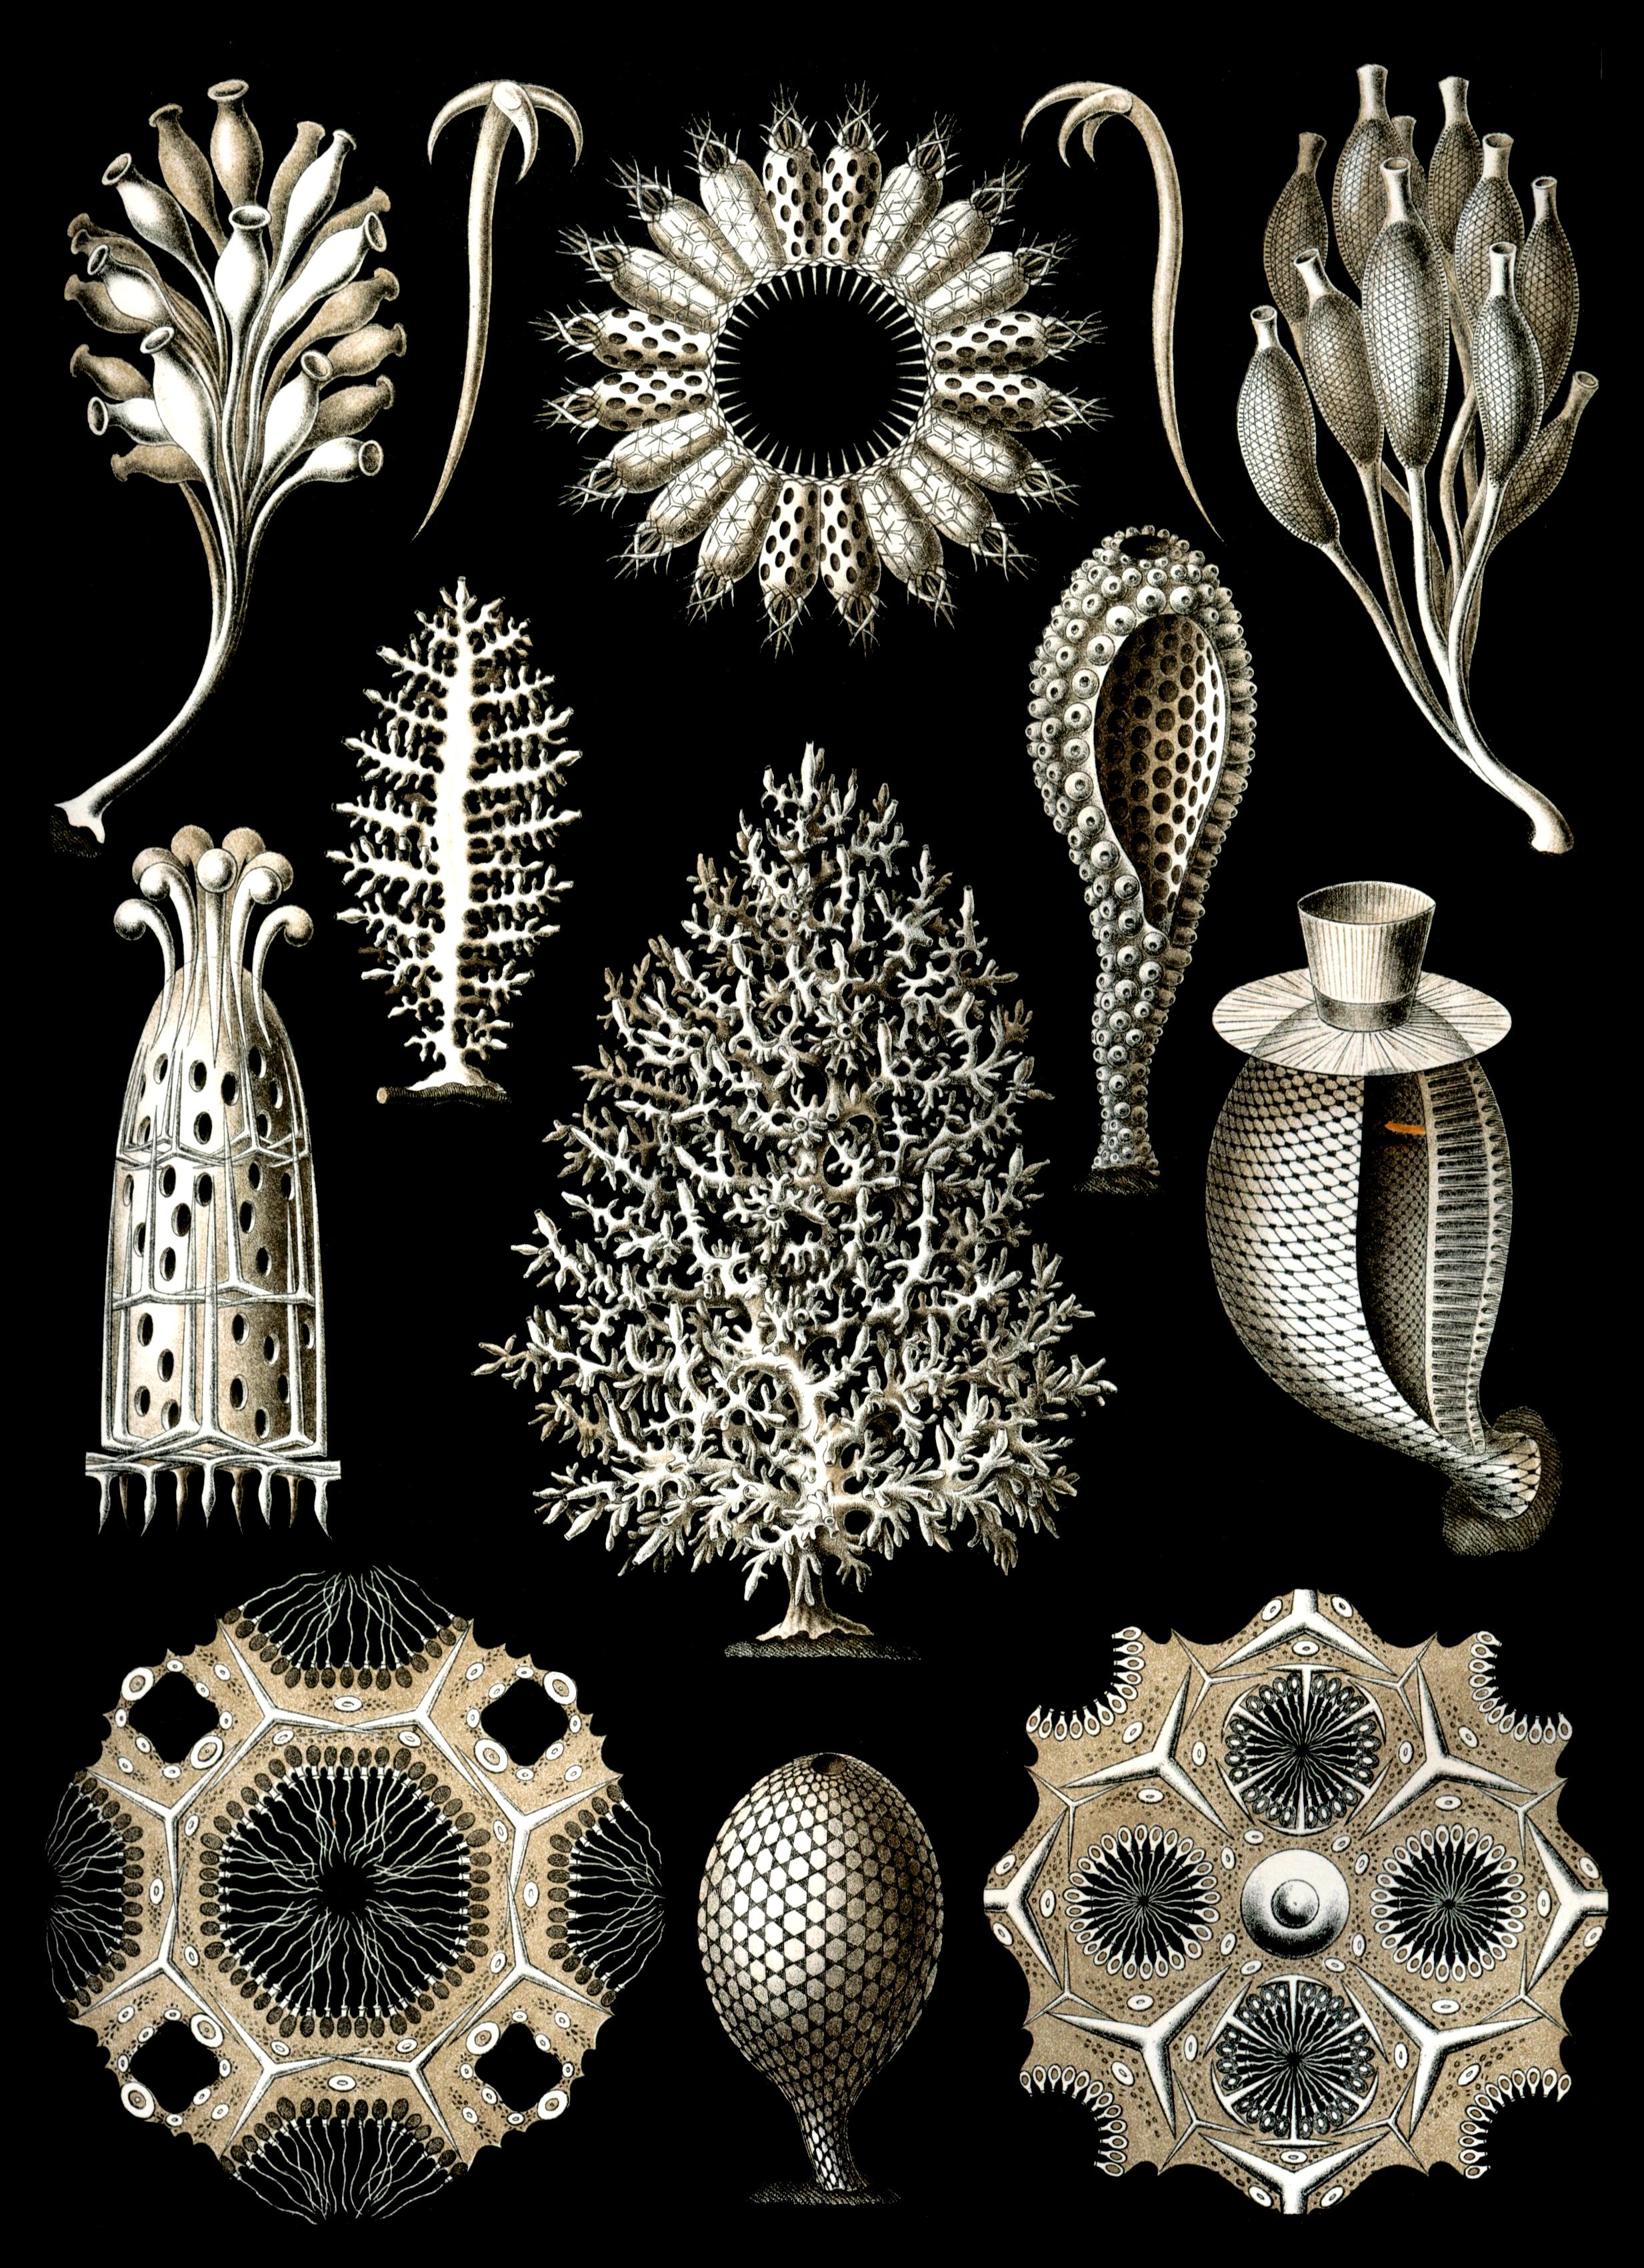 Calcareous sponge - Wikipedia